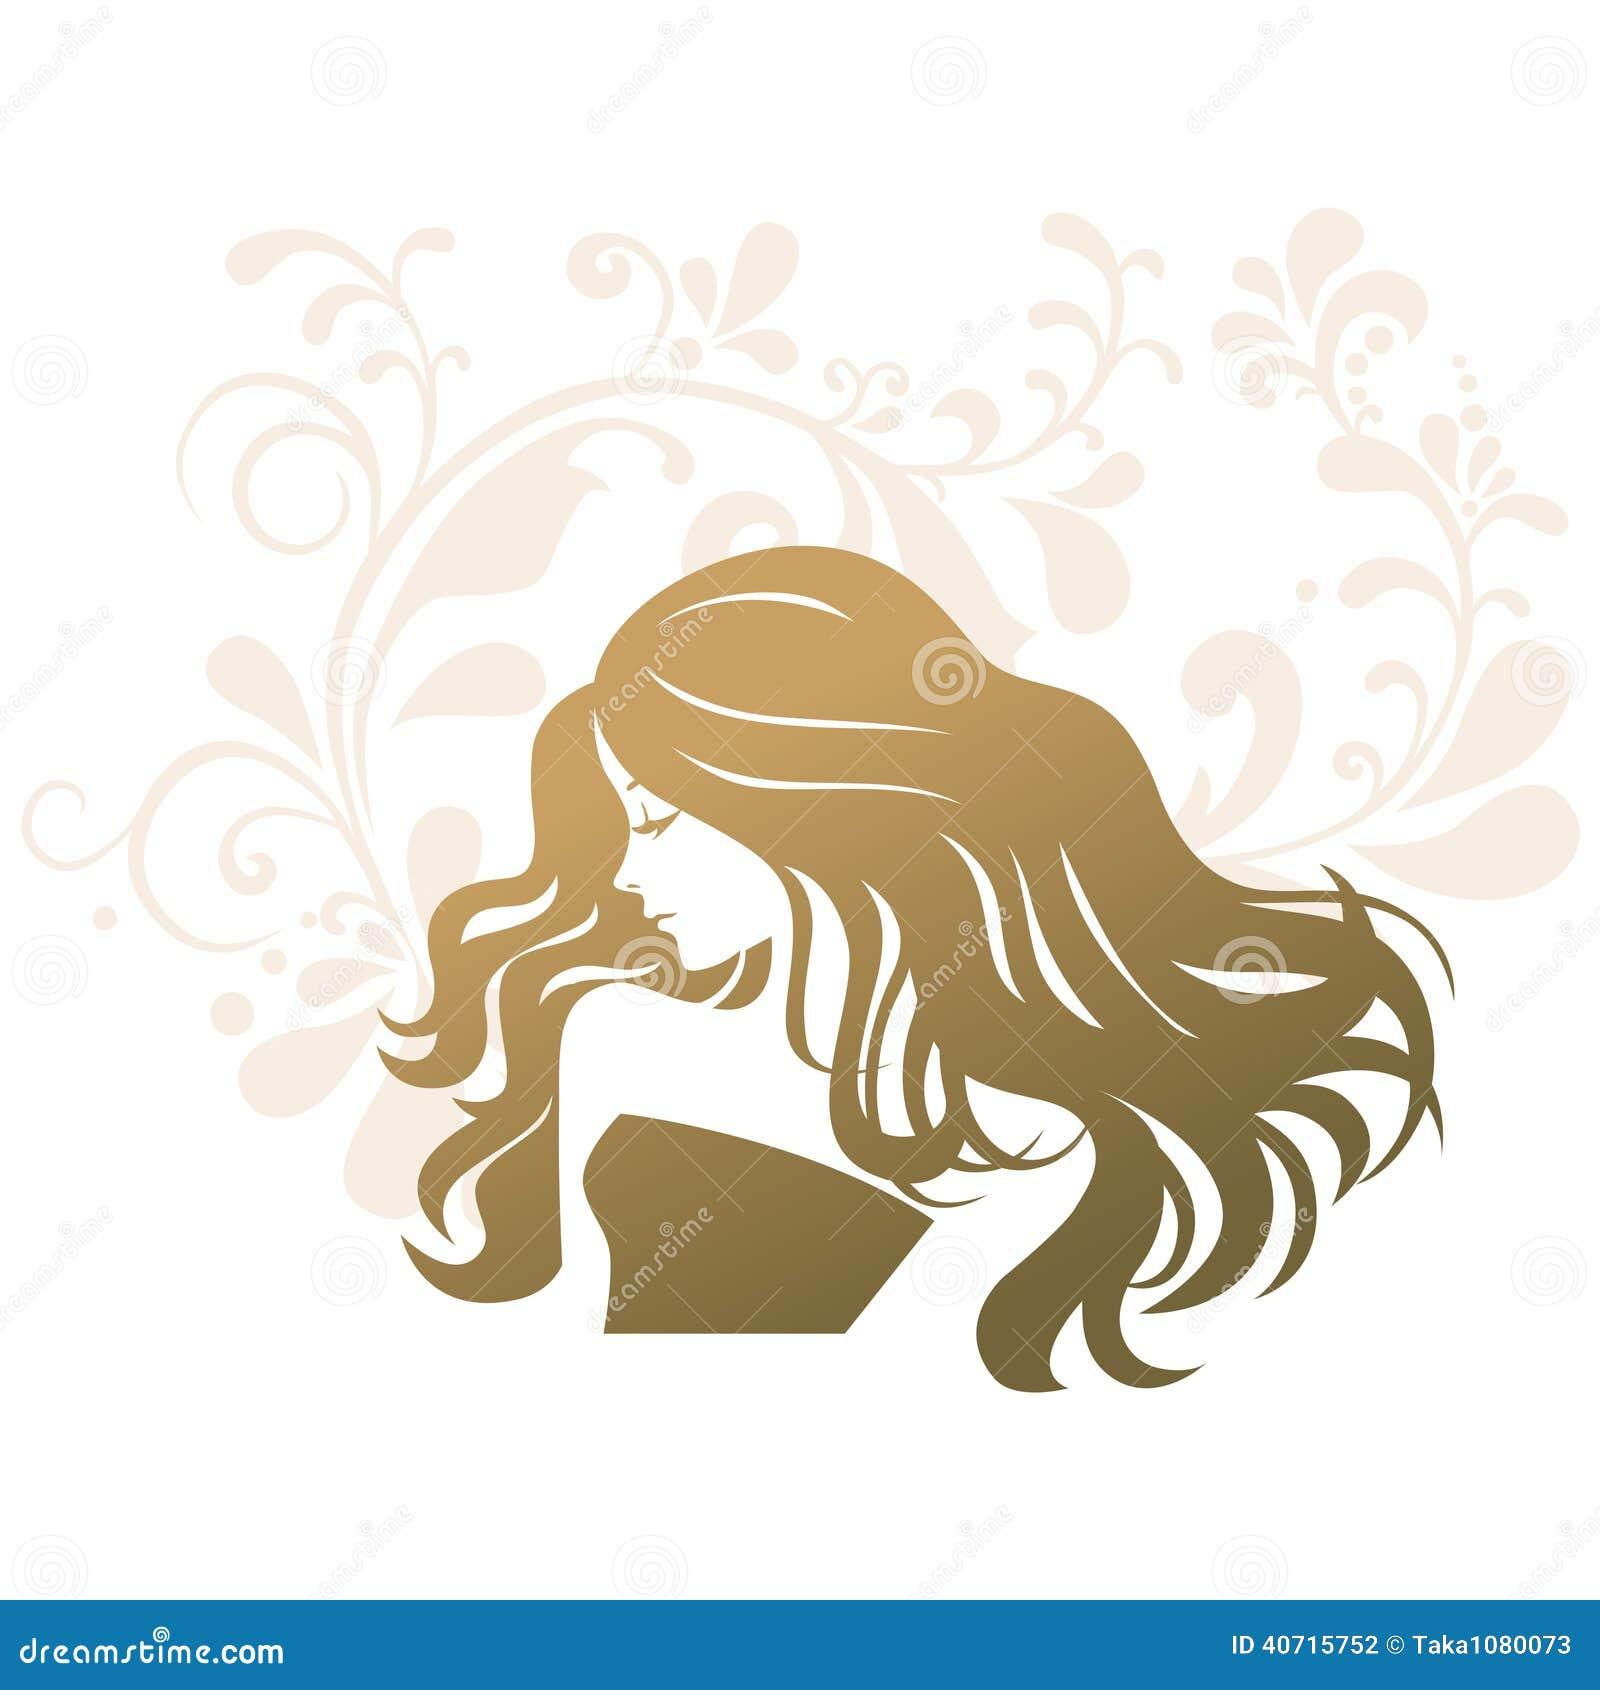 Beauty Treatment Salon Silhouette Woman Stock Vector